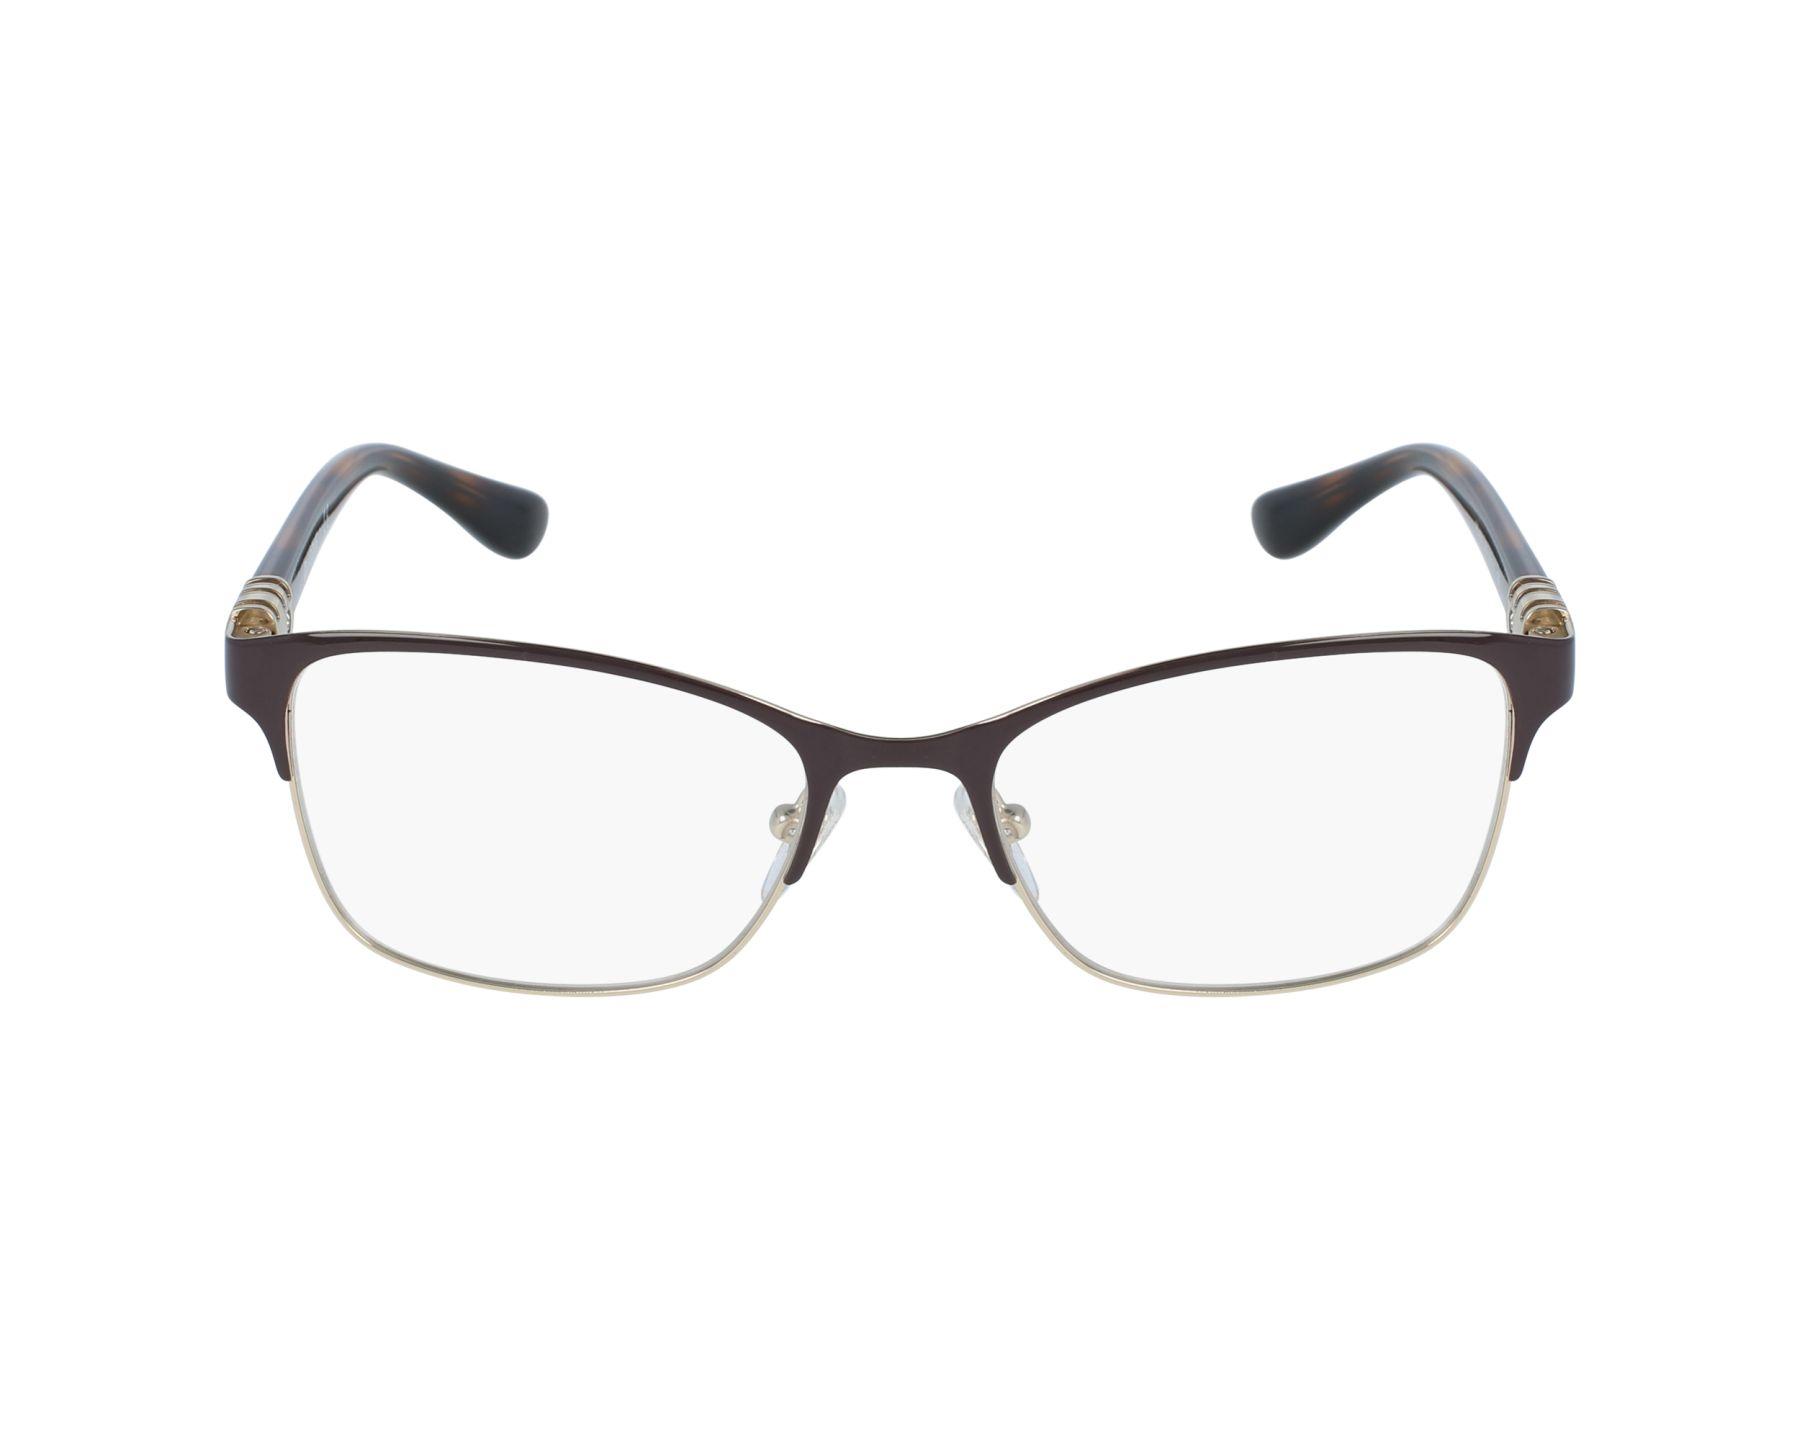 f2619ed56c Vogue Eyeglasses Brown VO-4050 997 - Visionet US